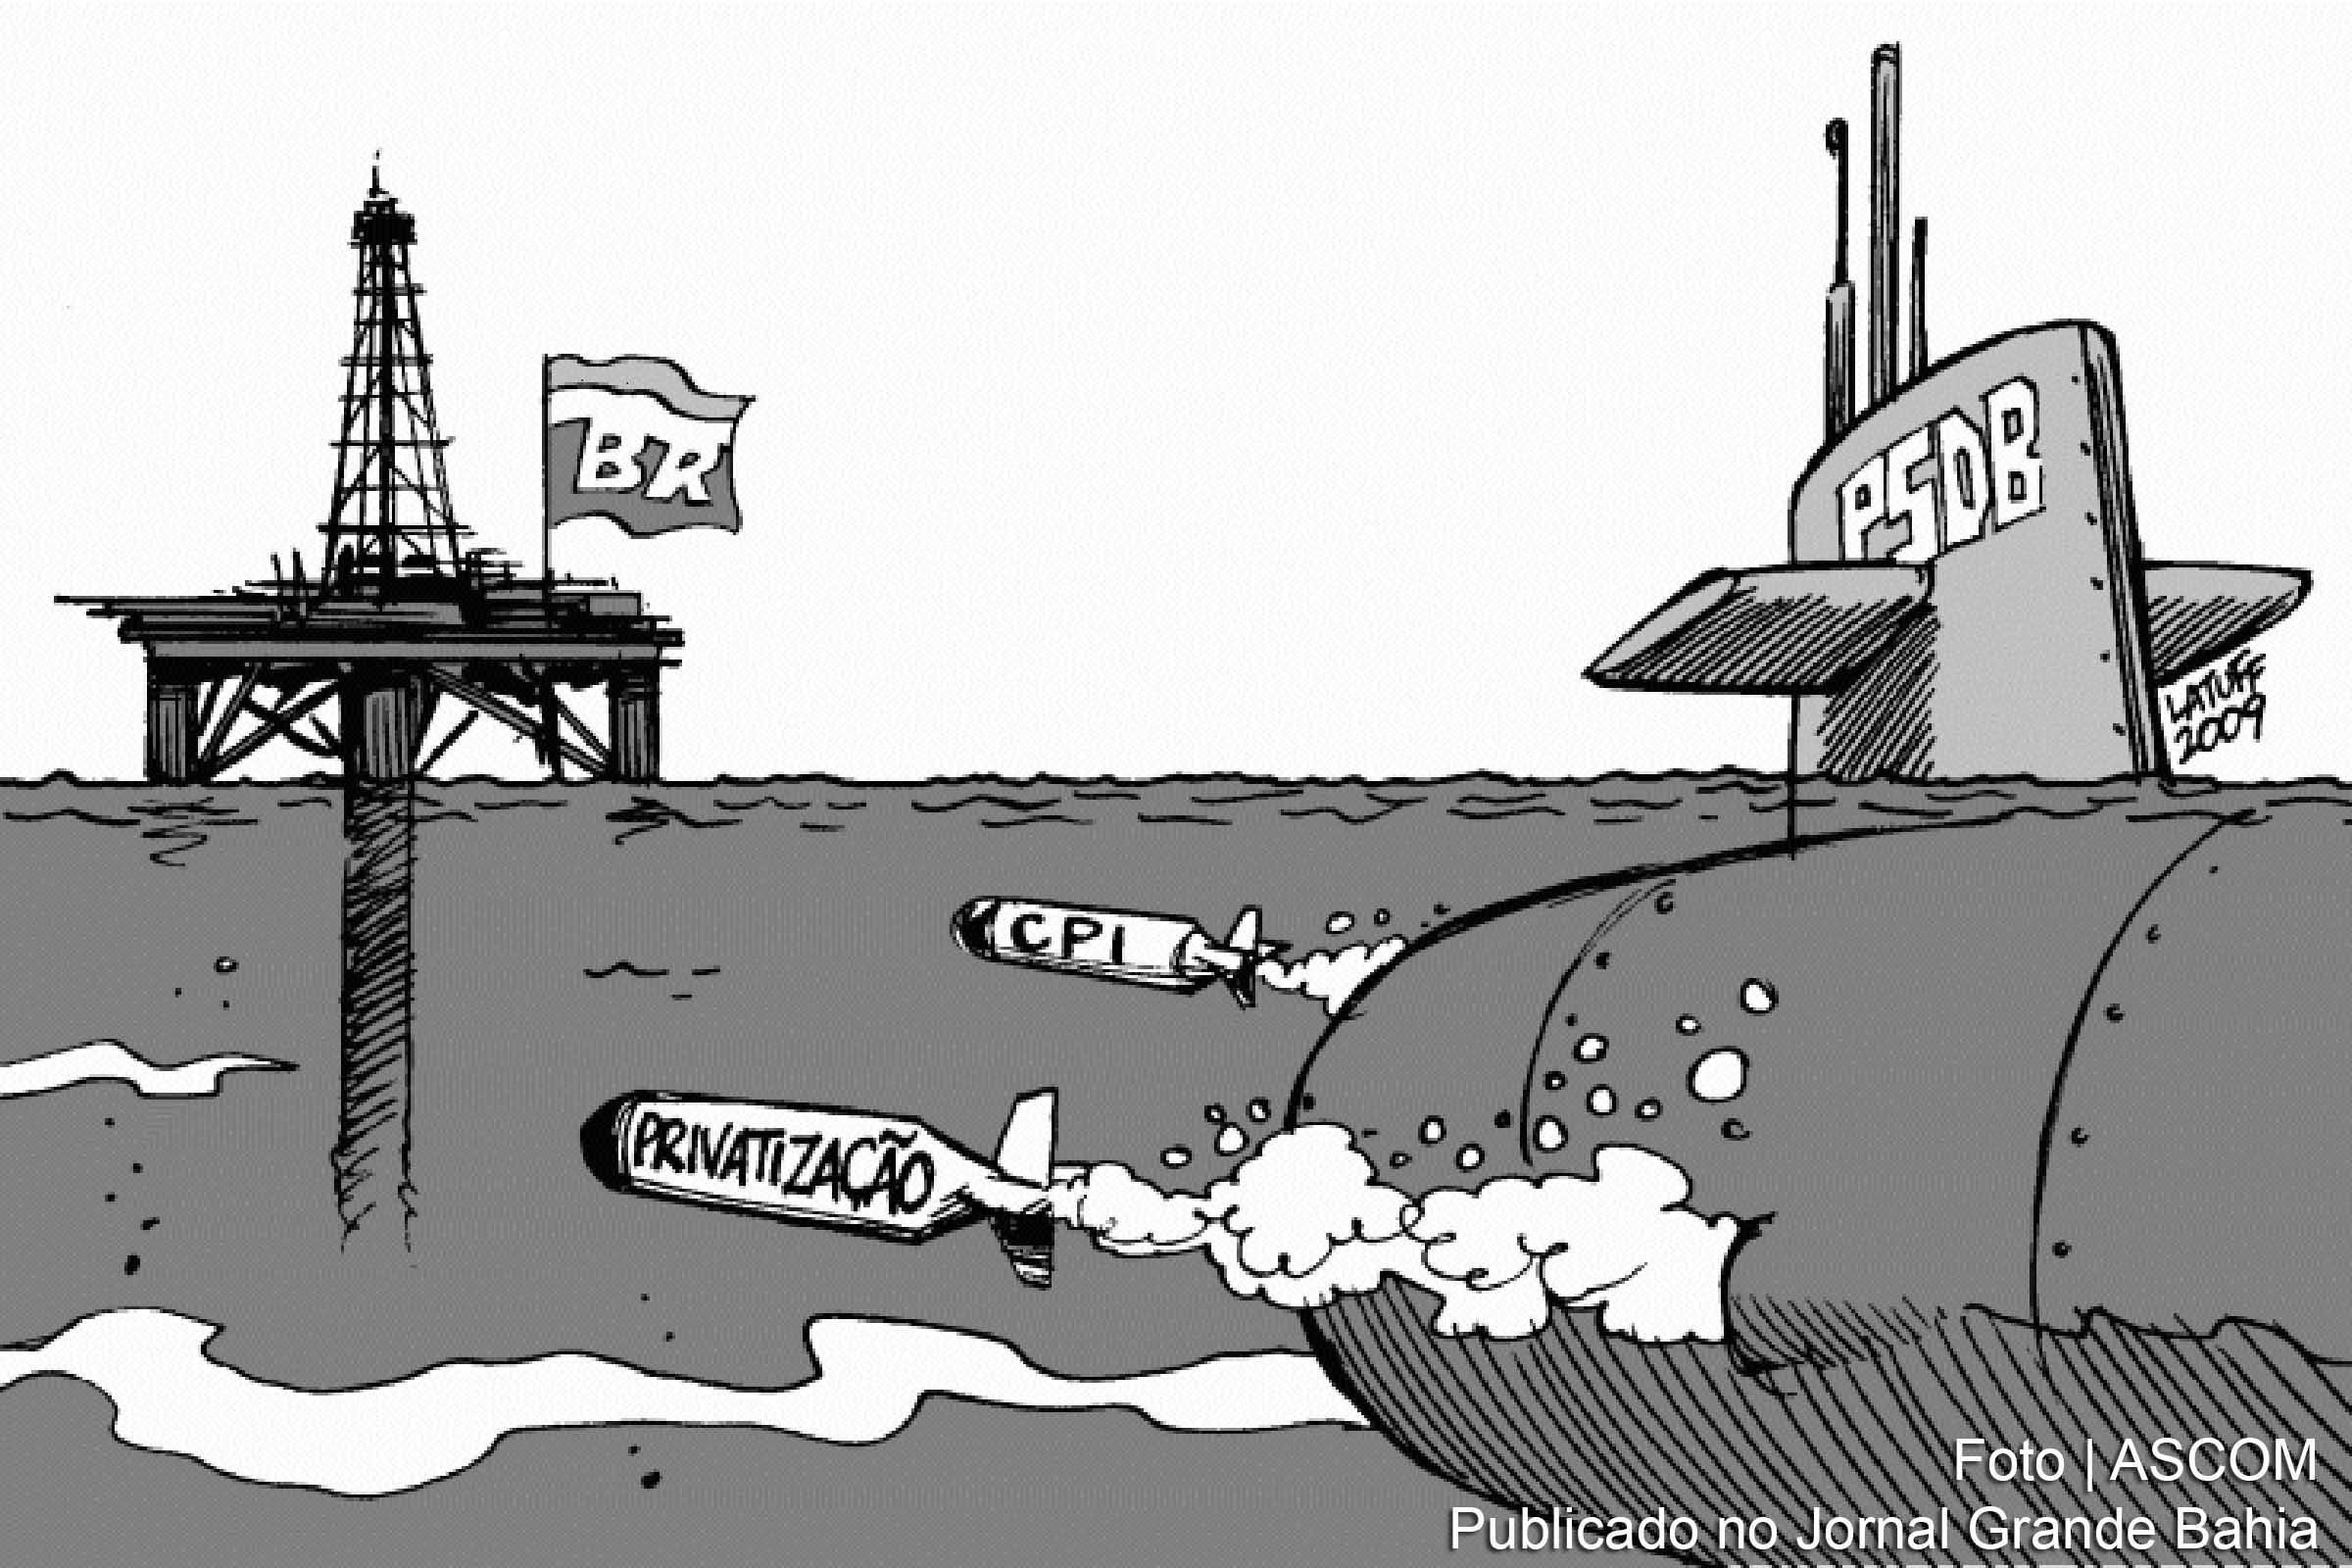 Inside the Gringo Oil Grab: Parente leaves, Petrobras hikes prices